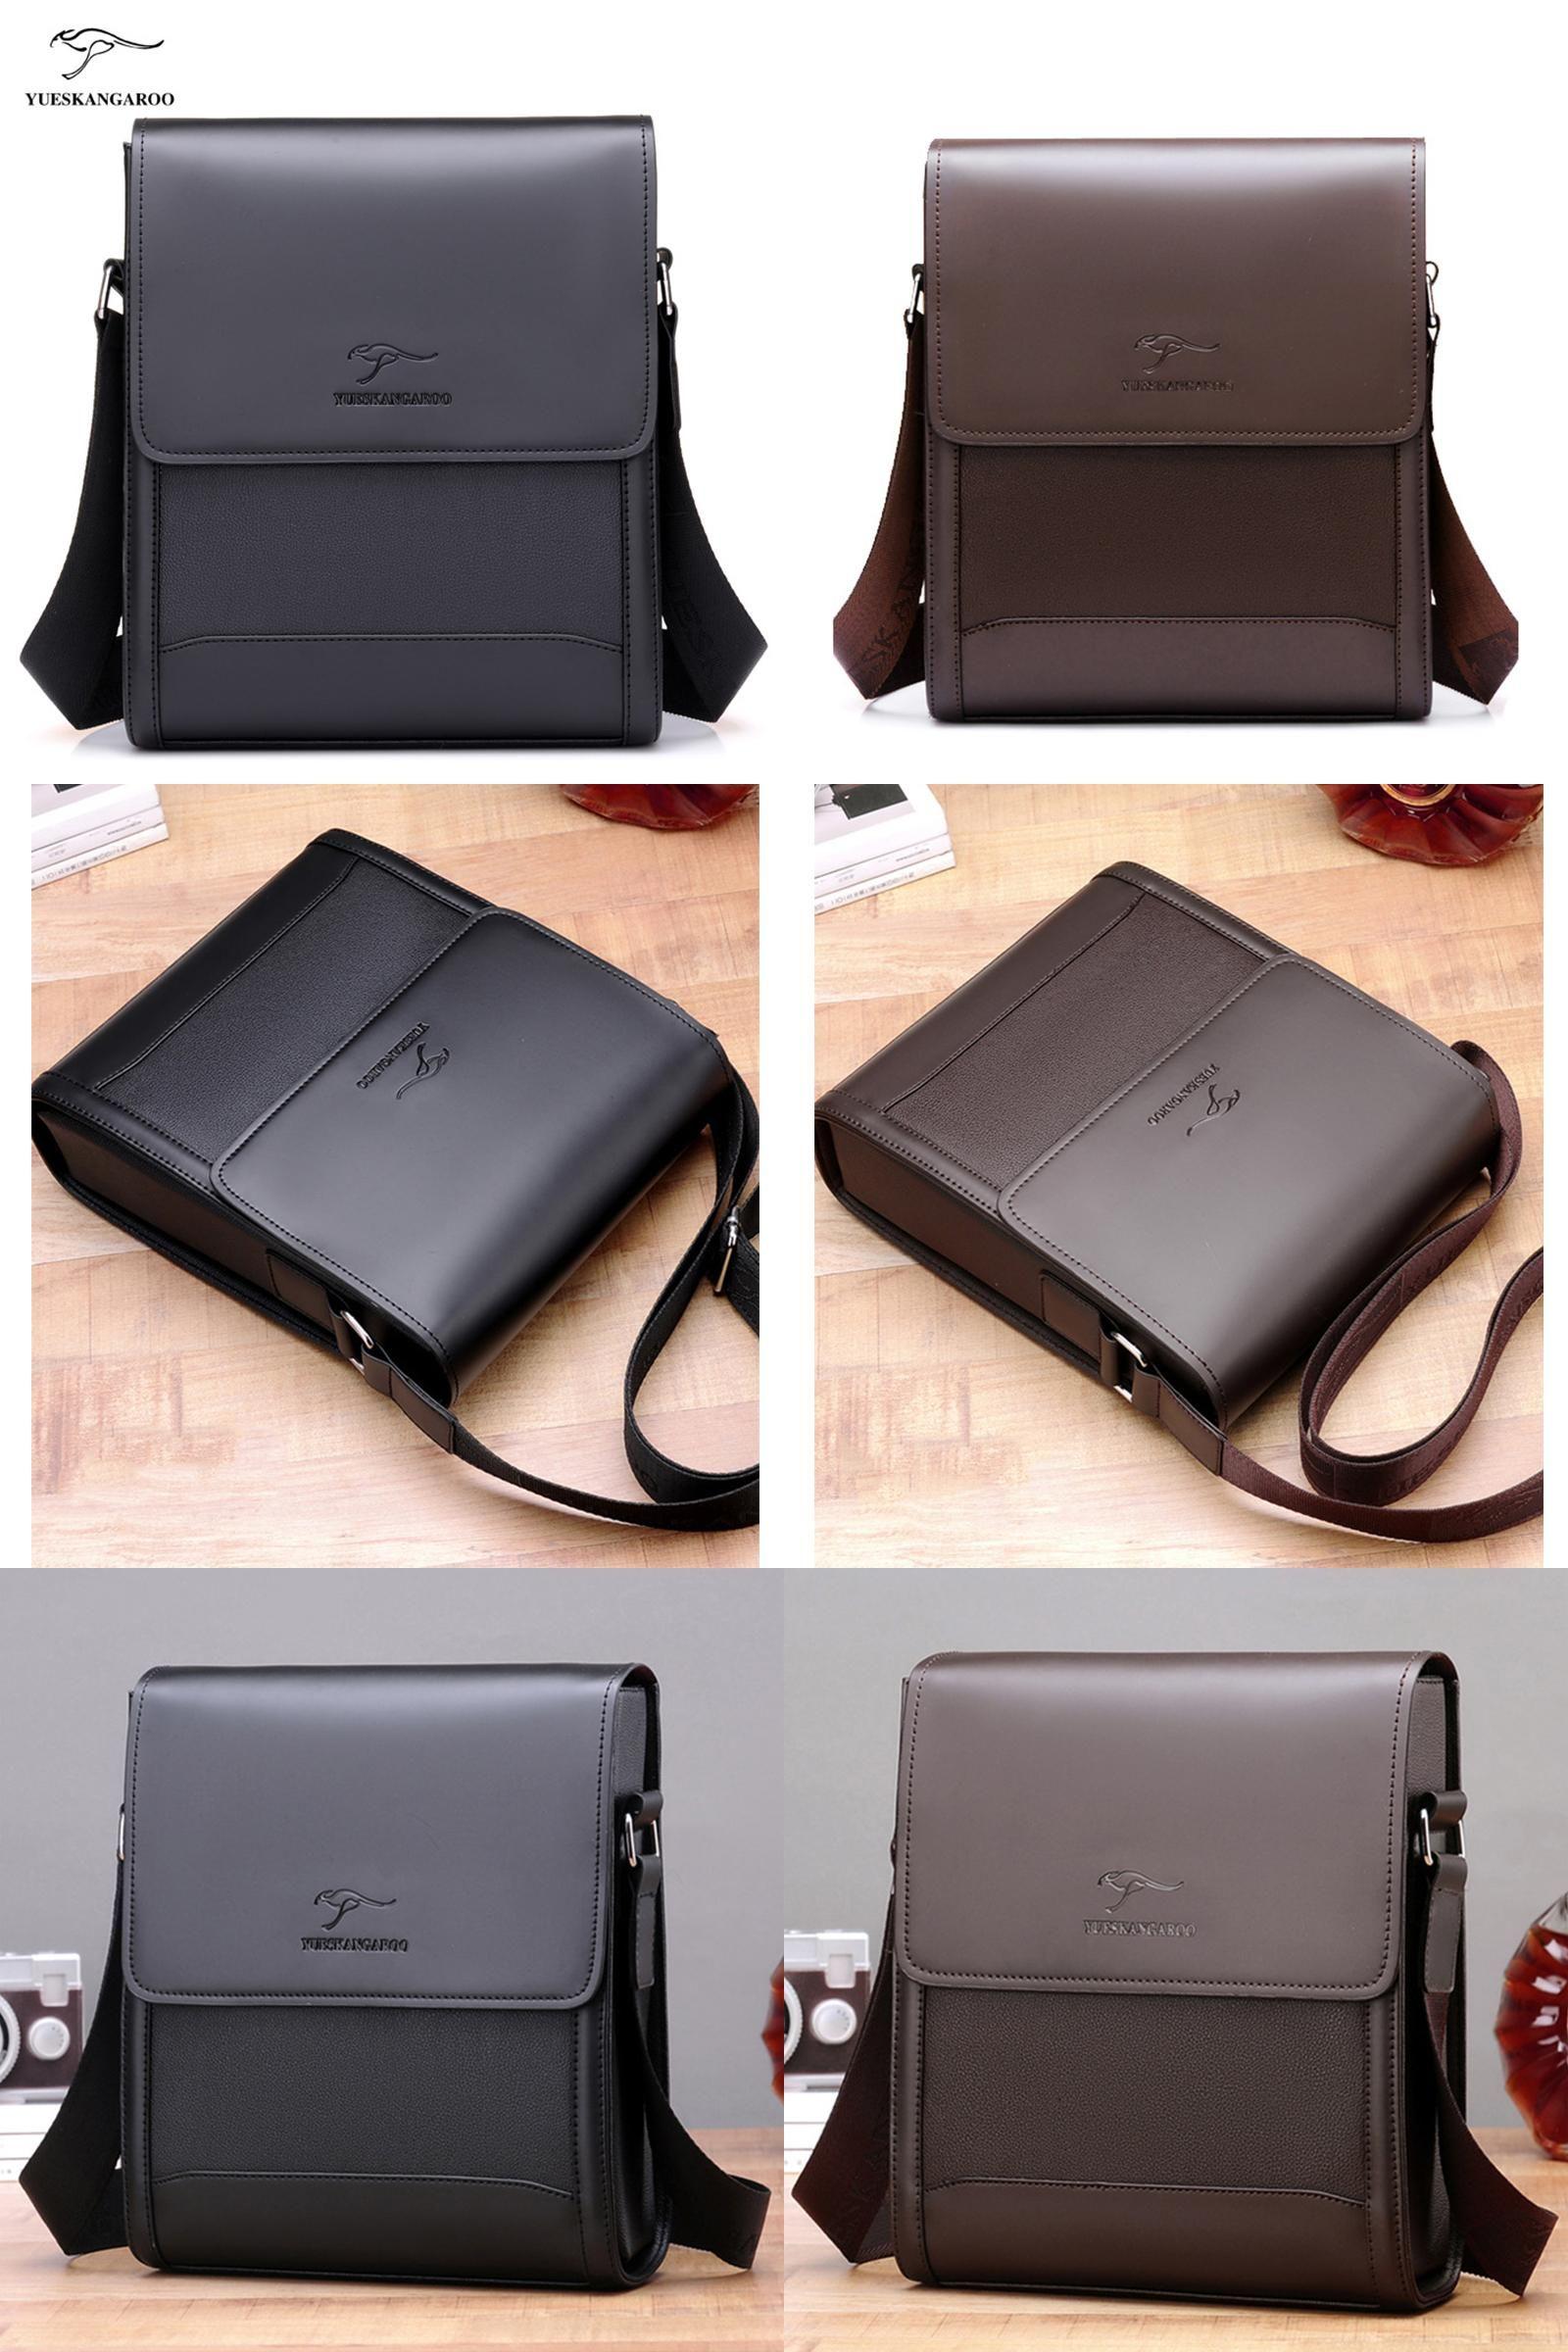 fc5c270512f9 [Visit to Buy] YUES KANGAROO Men Bags Hot Male Small Messenger Bag Man  Fashion Leather Crossbody Shoulder Bag Men's Travel New Bag #Advertisement